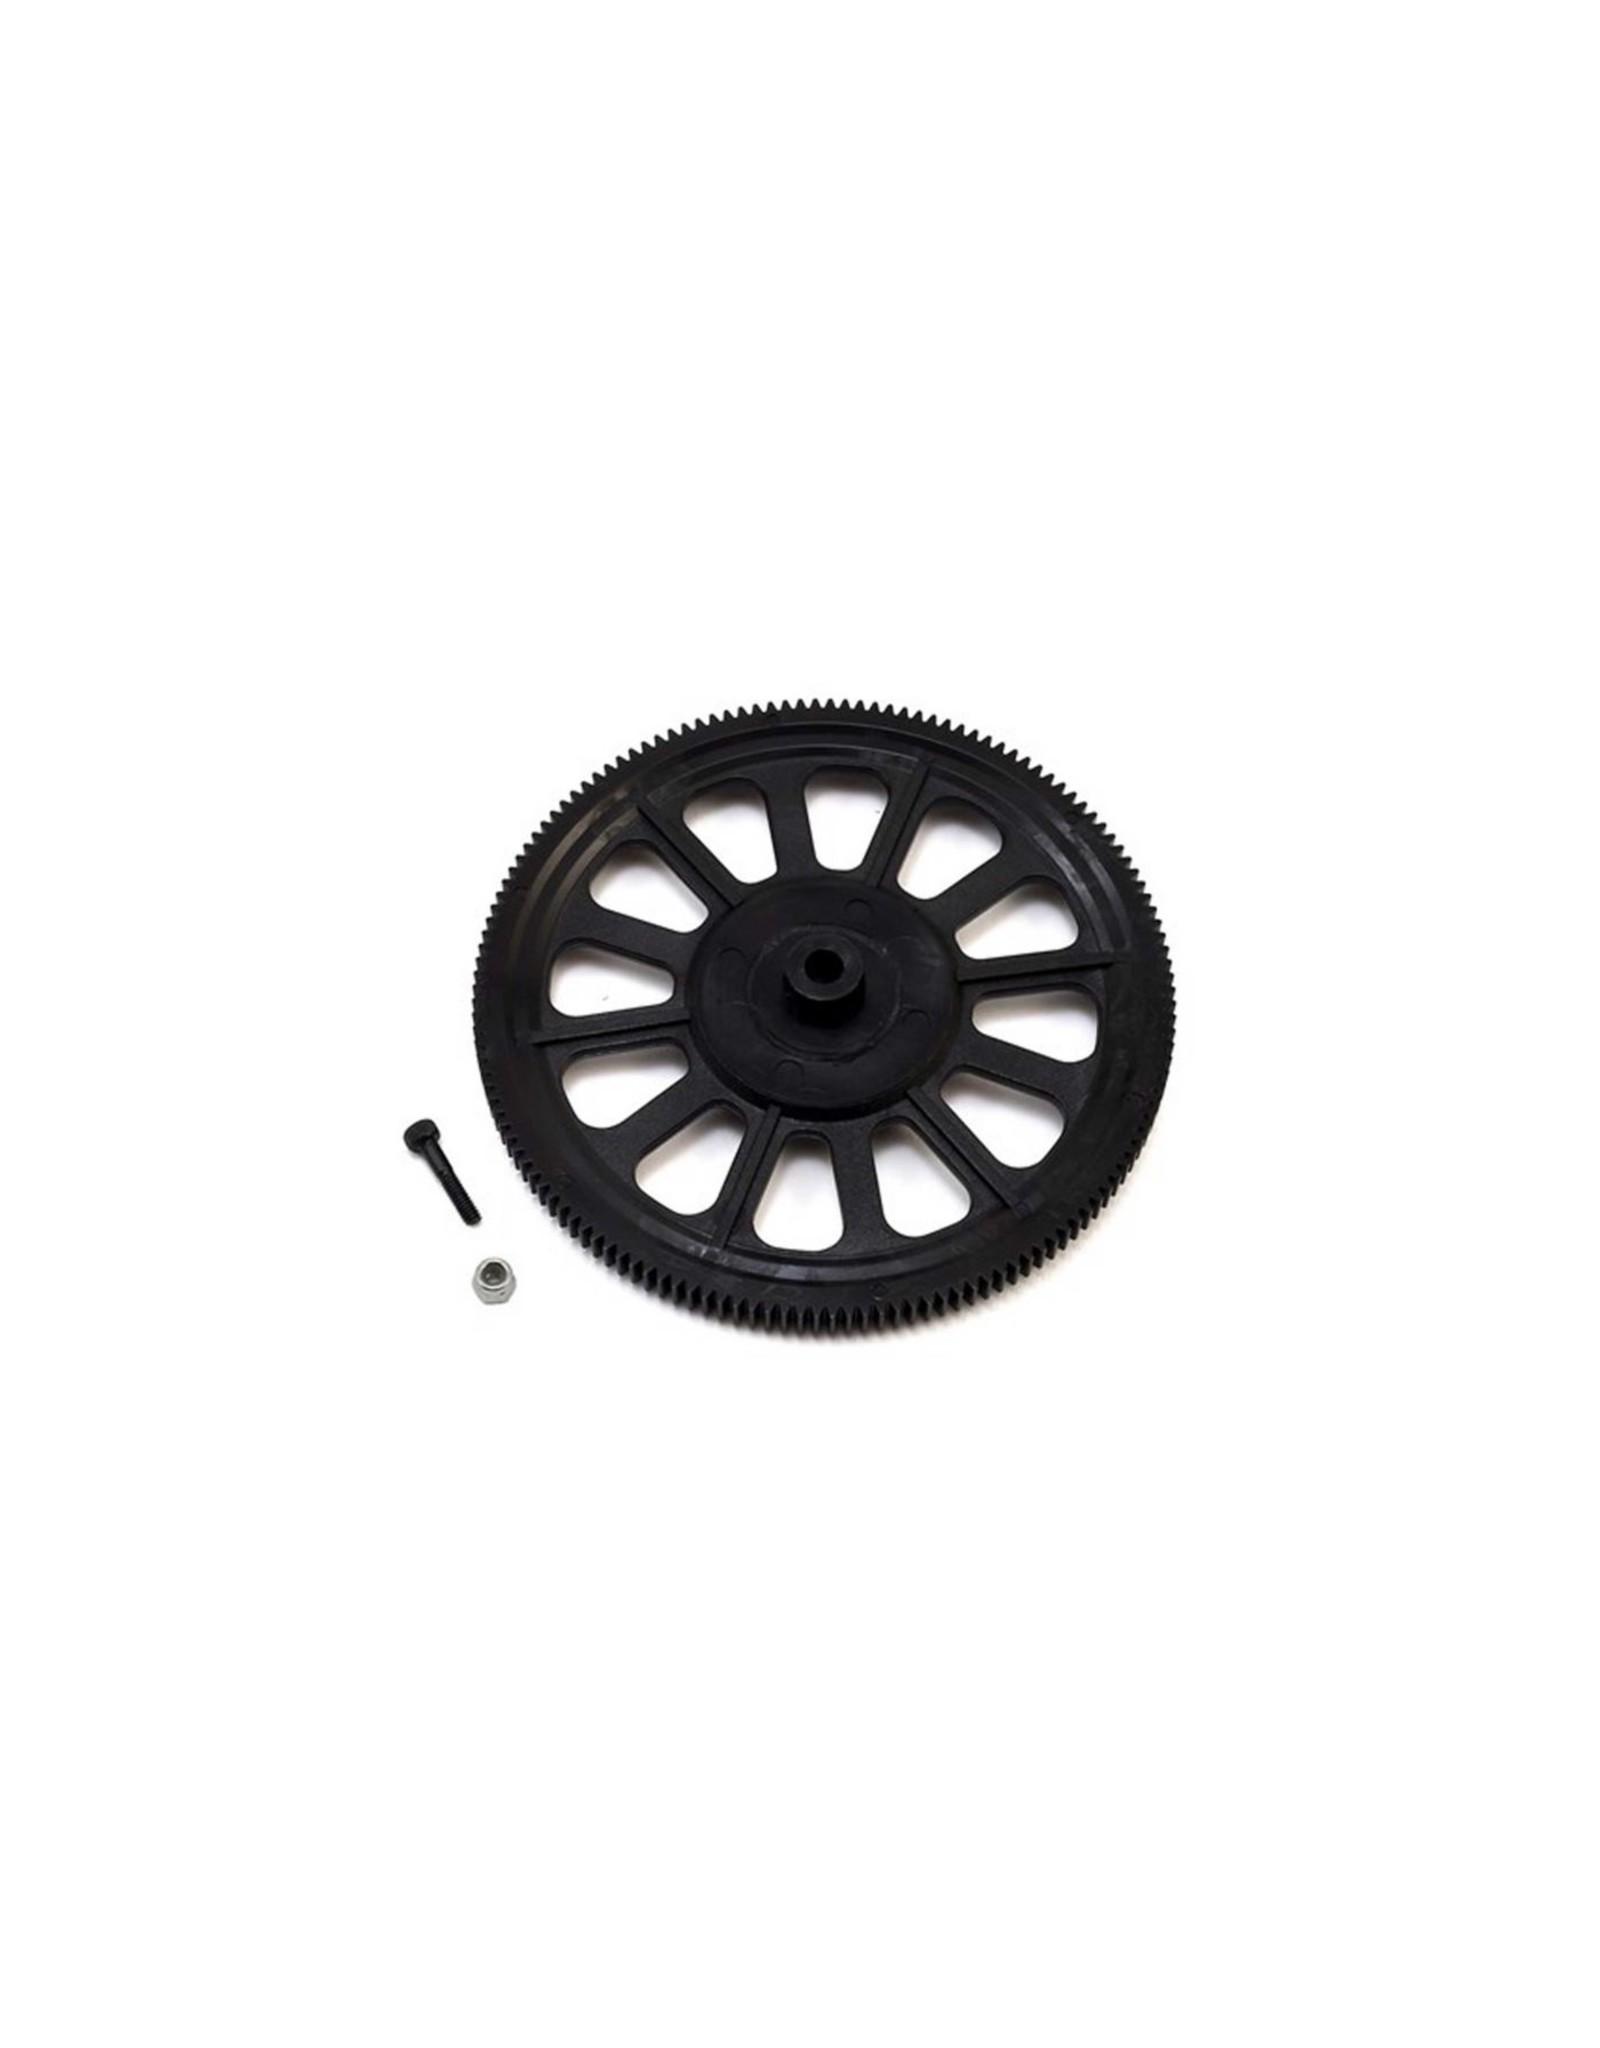 Blade 1402 - Main Gear 230 S V2